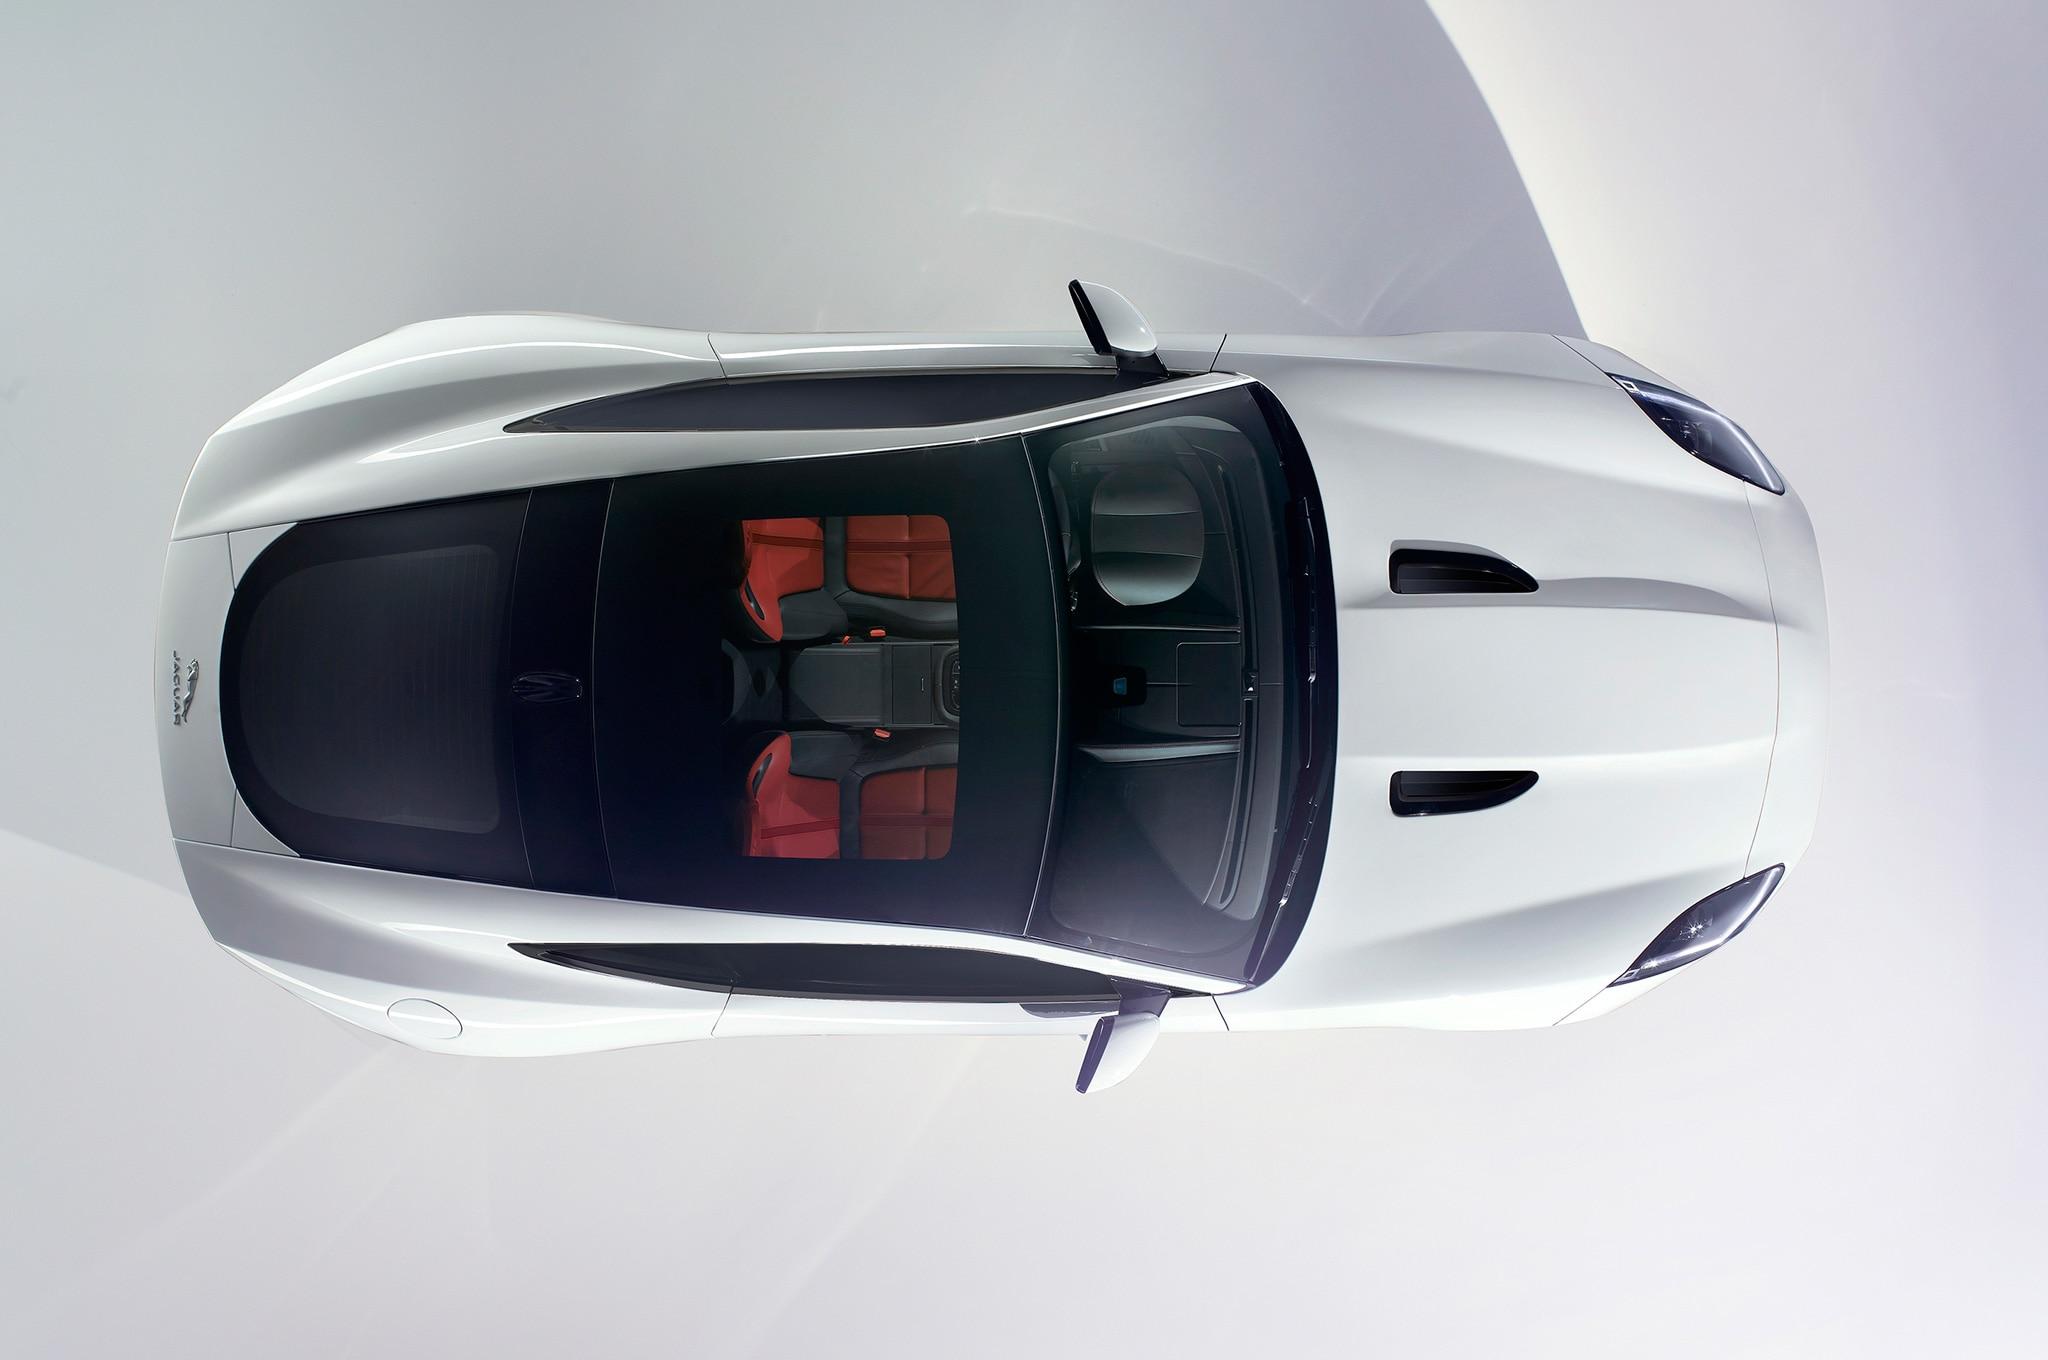 2015 Jaguar F Type Coupe Overhead View